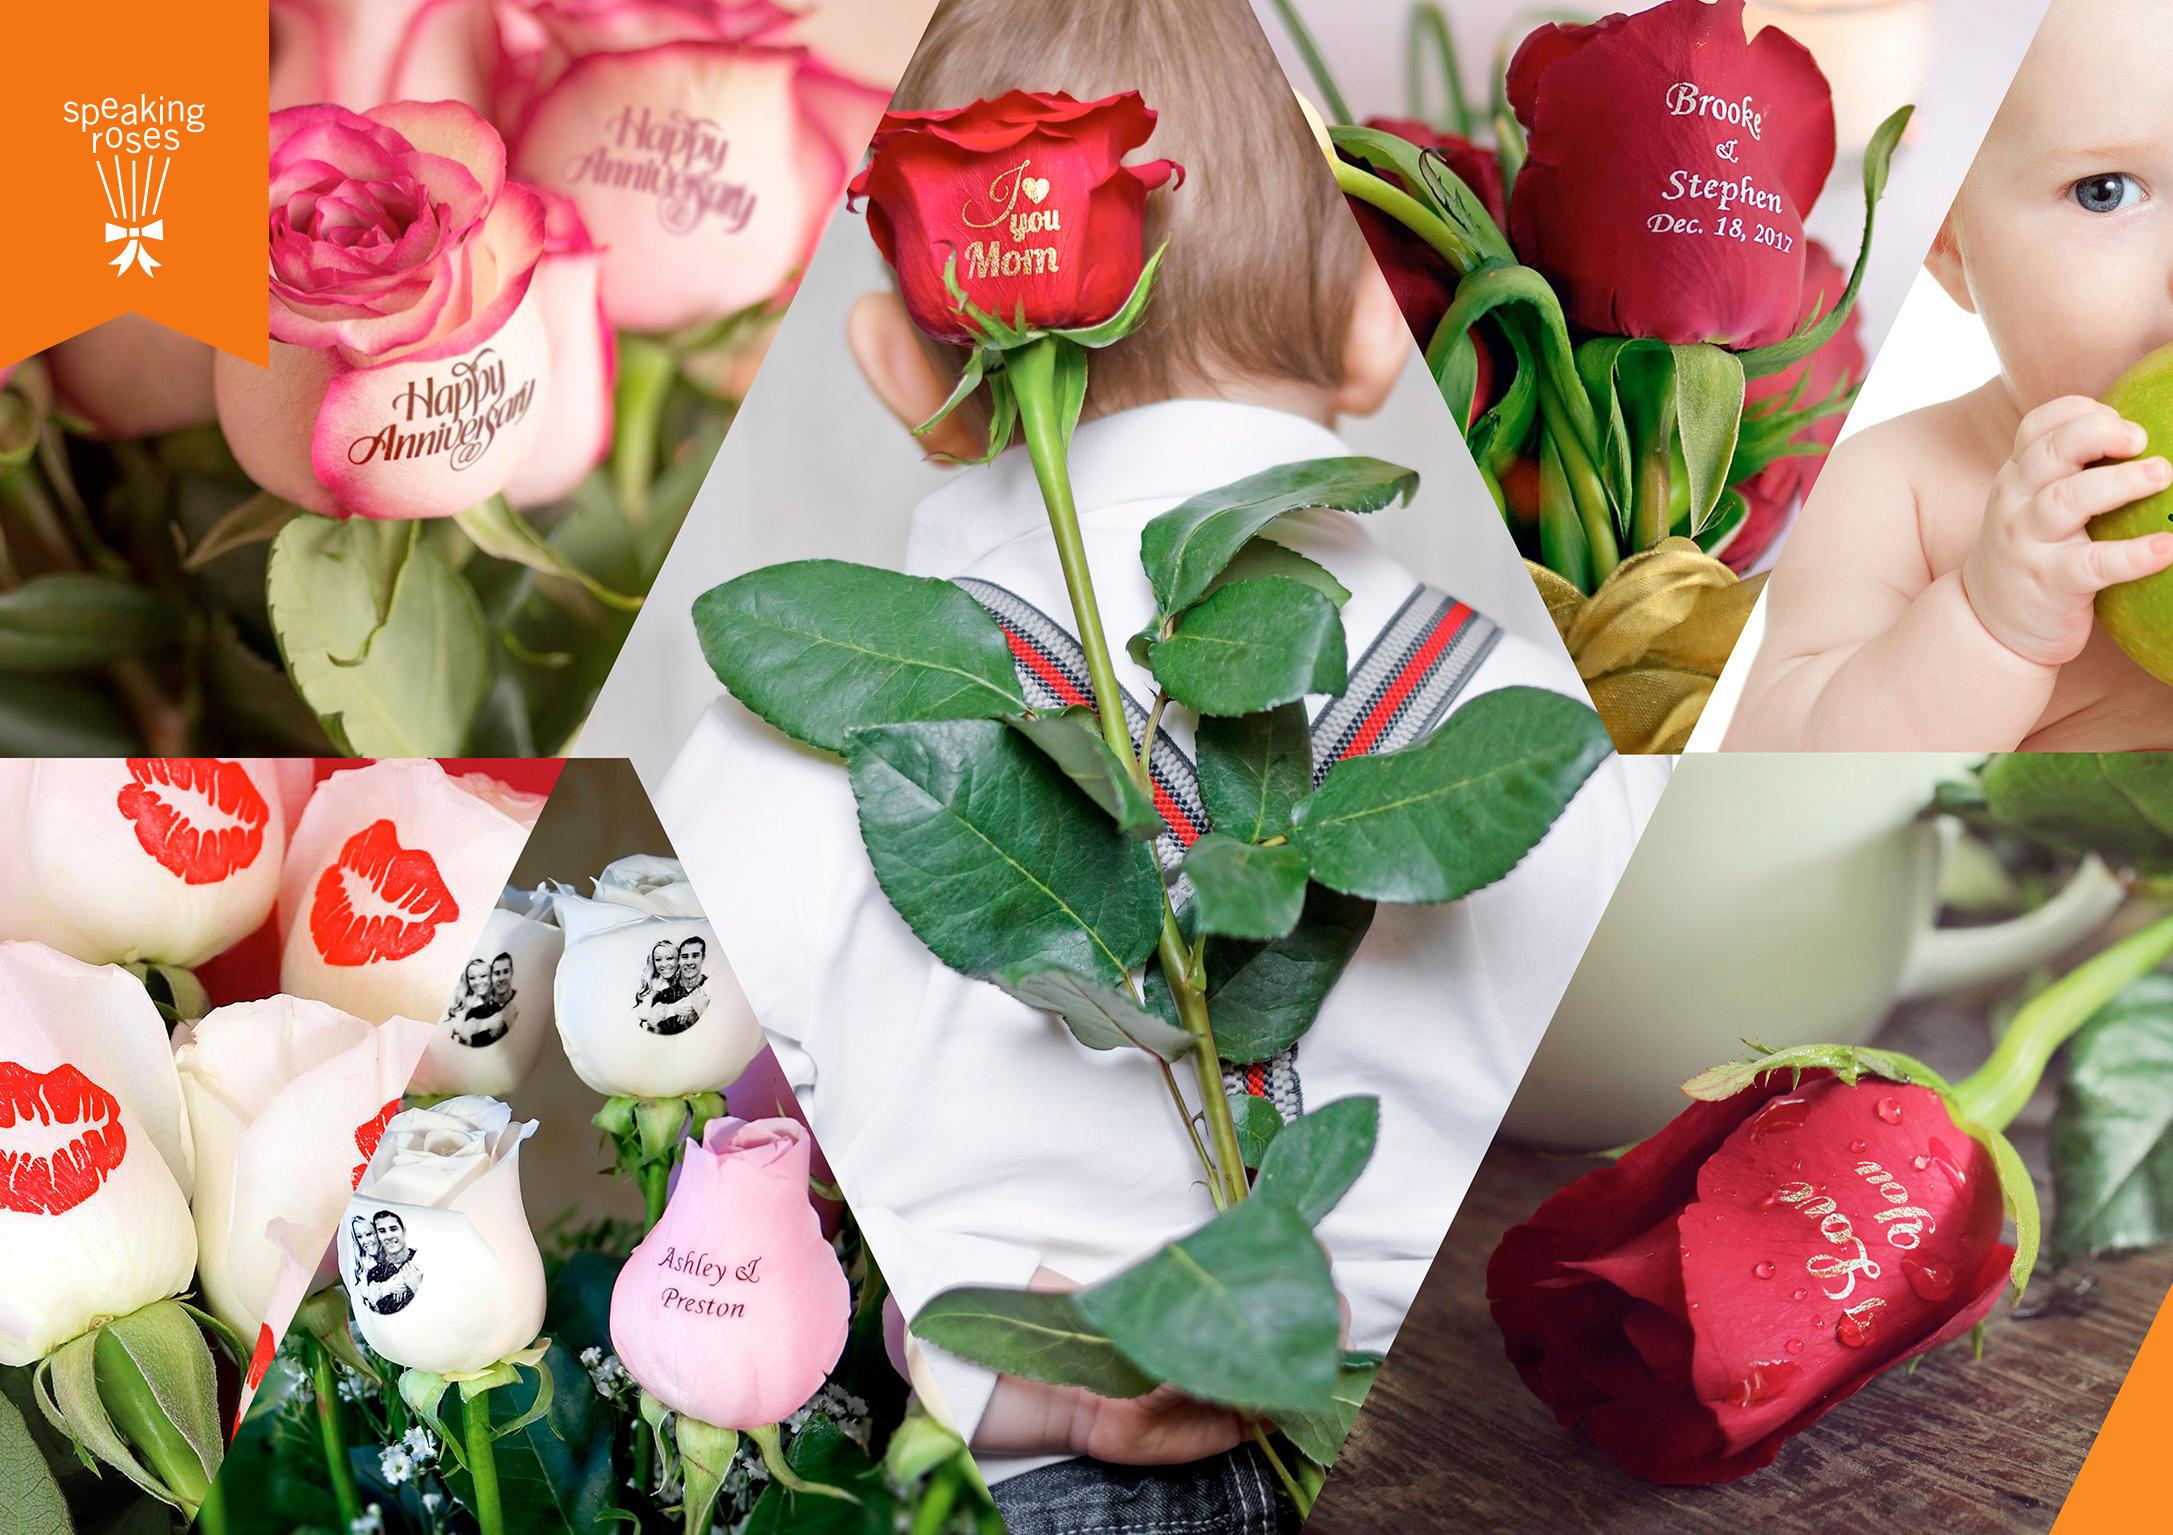 Speaking Roses International image 1